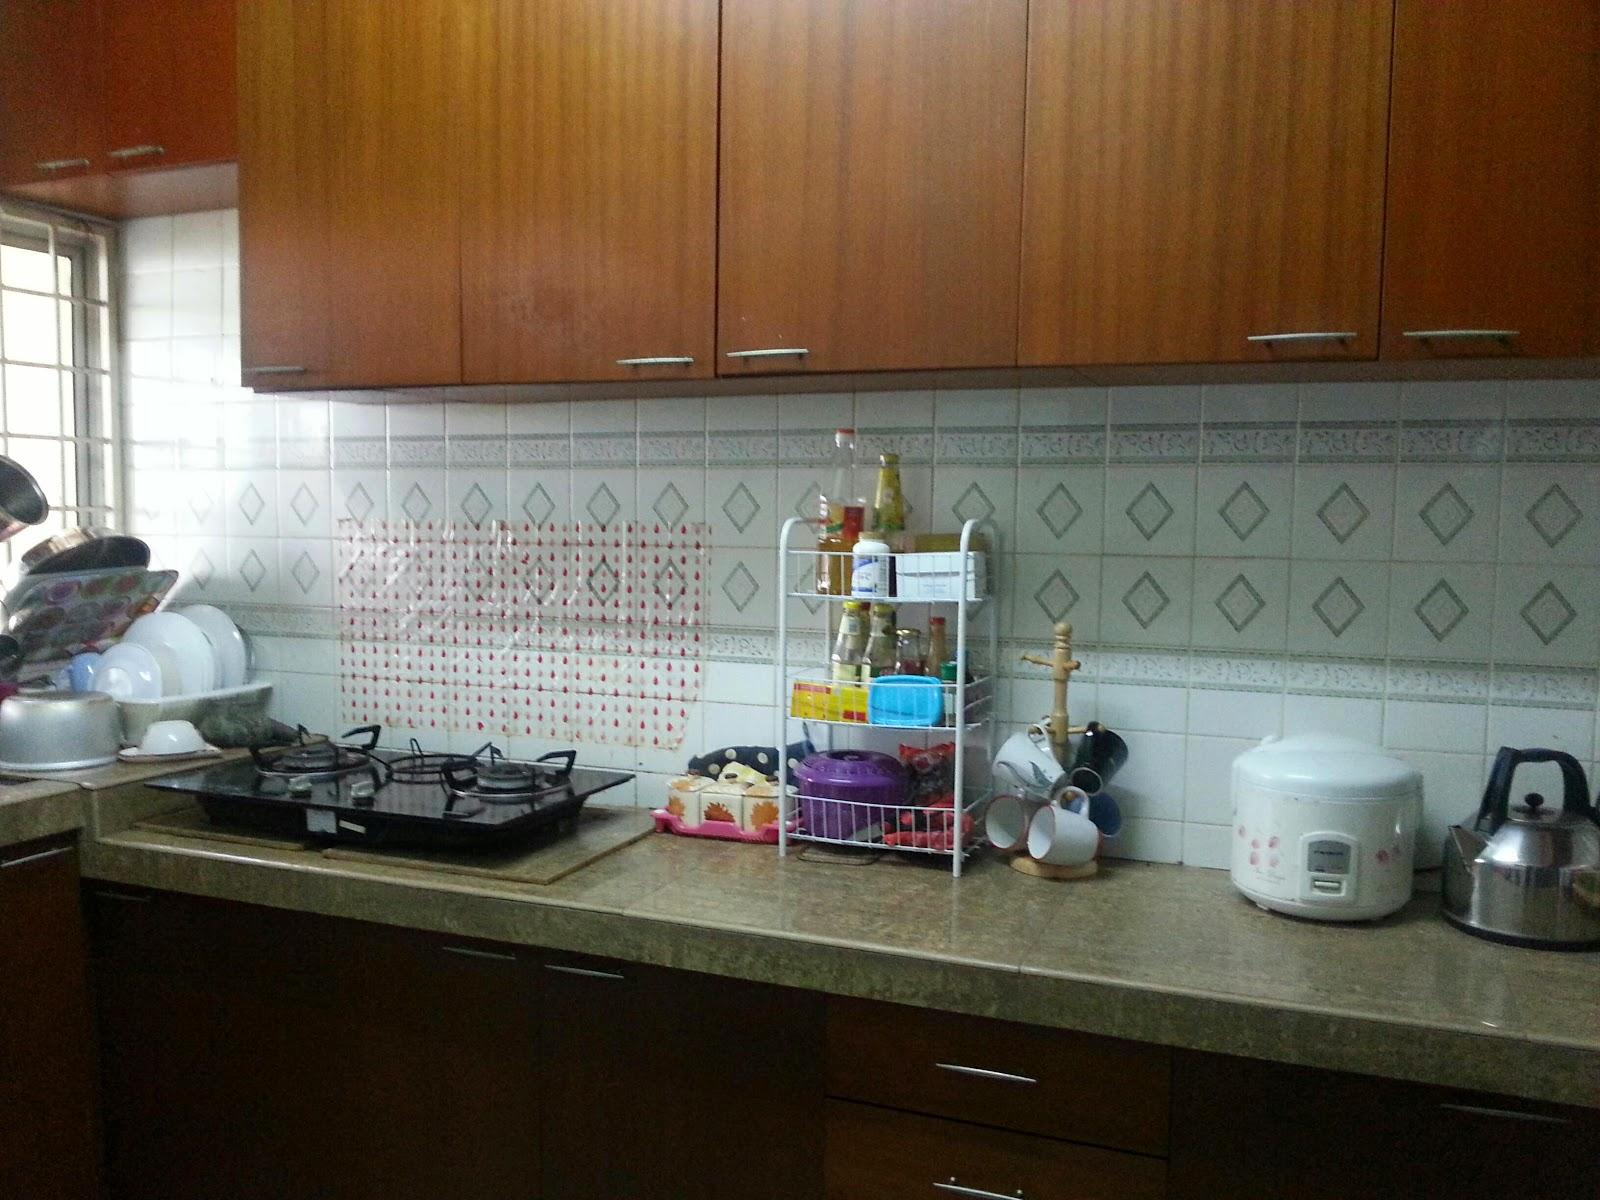 Dapur Buruk Saya Simple Je Kabinet Pun Owner Dulu Punya Bila La Nak Buat Kc Baru Insya Dalam Perancangan Sabaq Naaaaaa